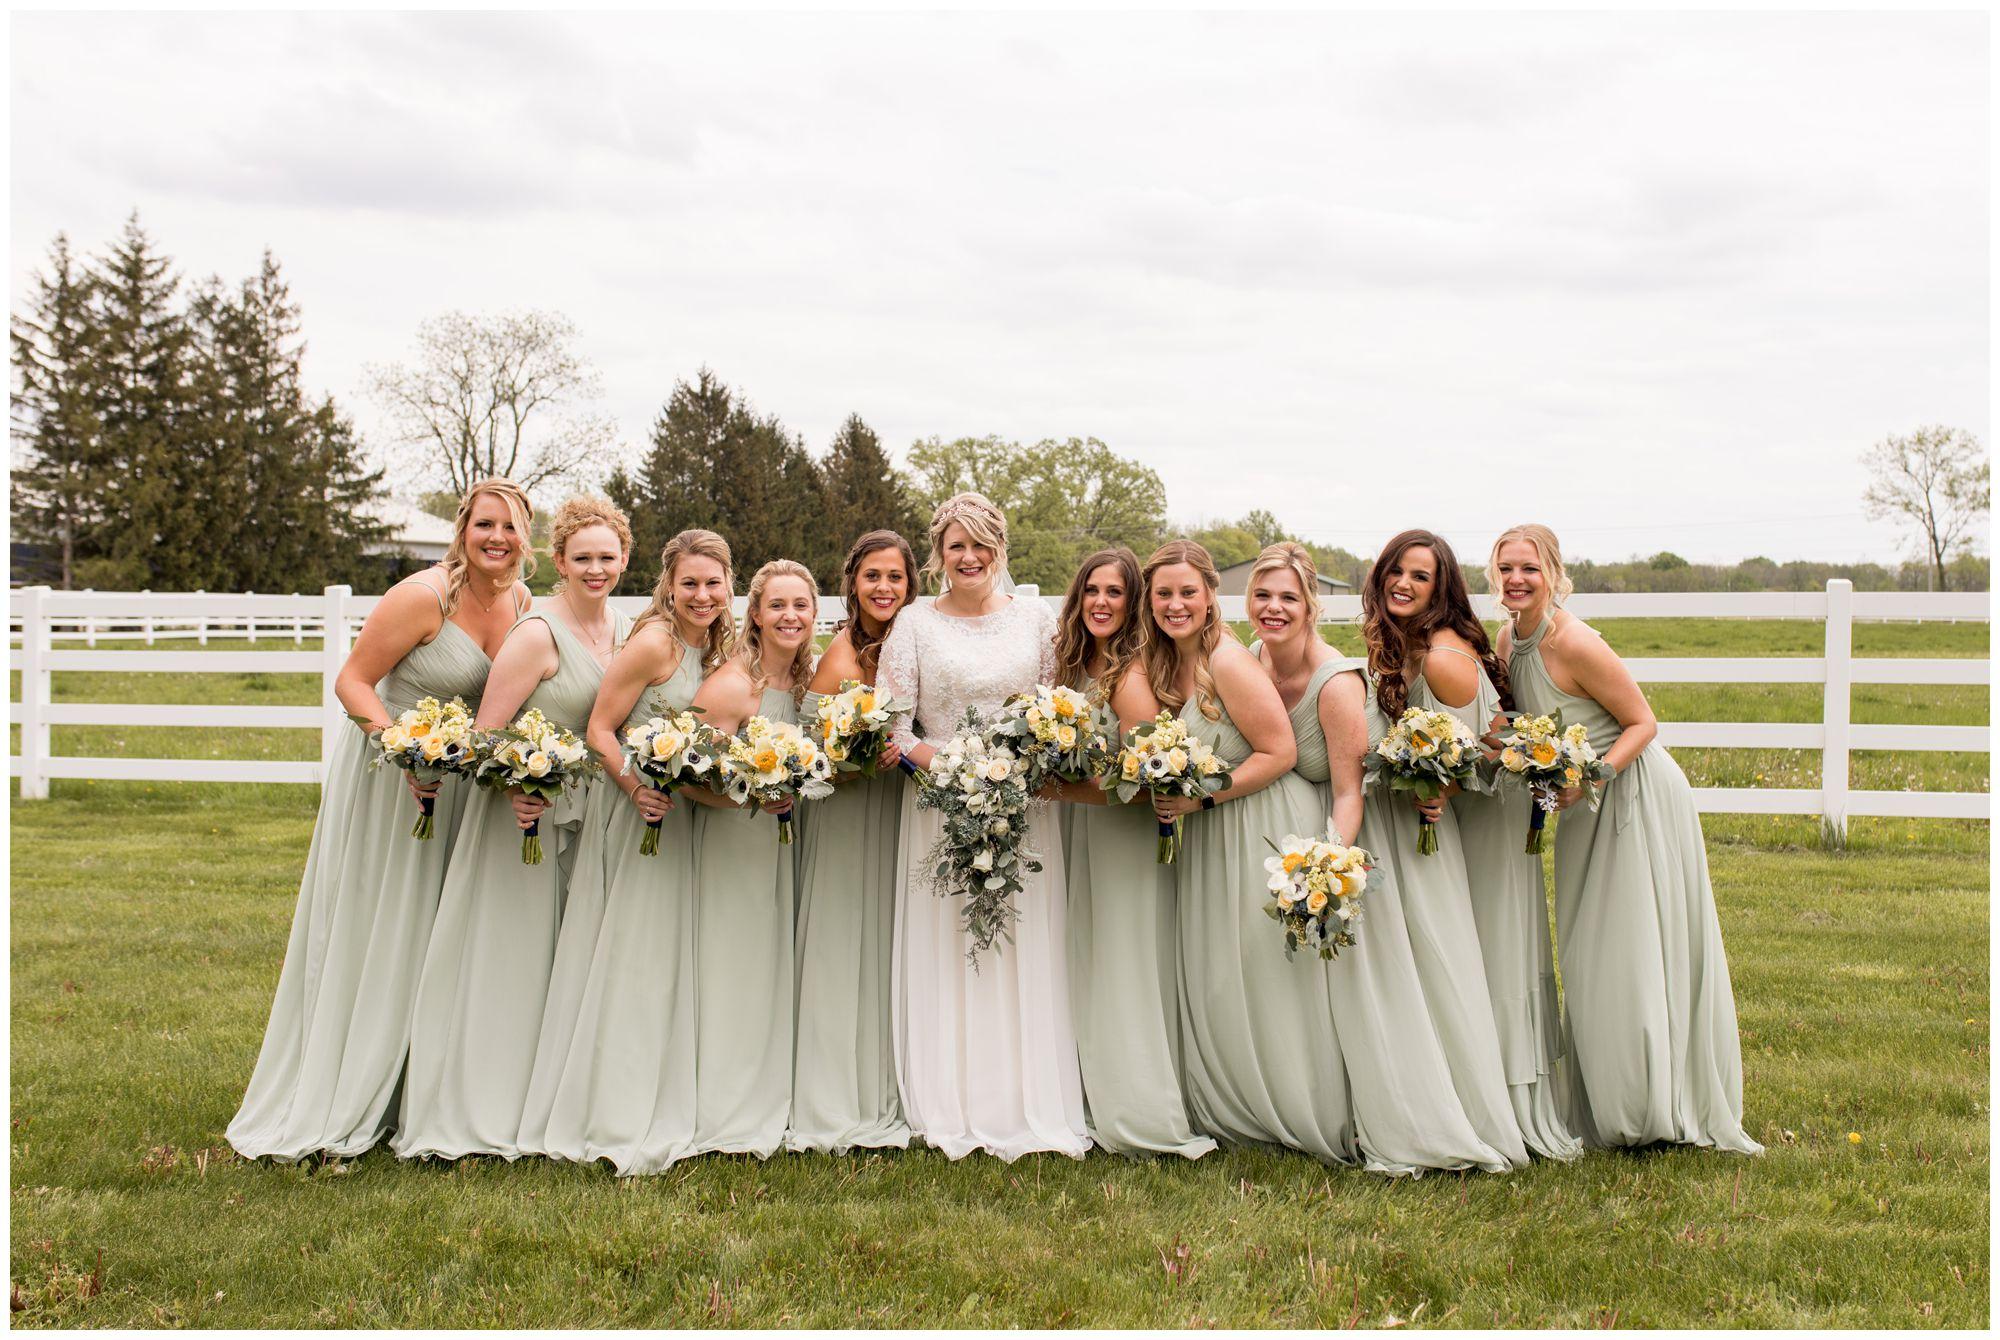 bride with bridesmaids before wedding ceremony in Muncie Indiana